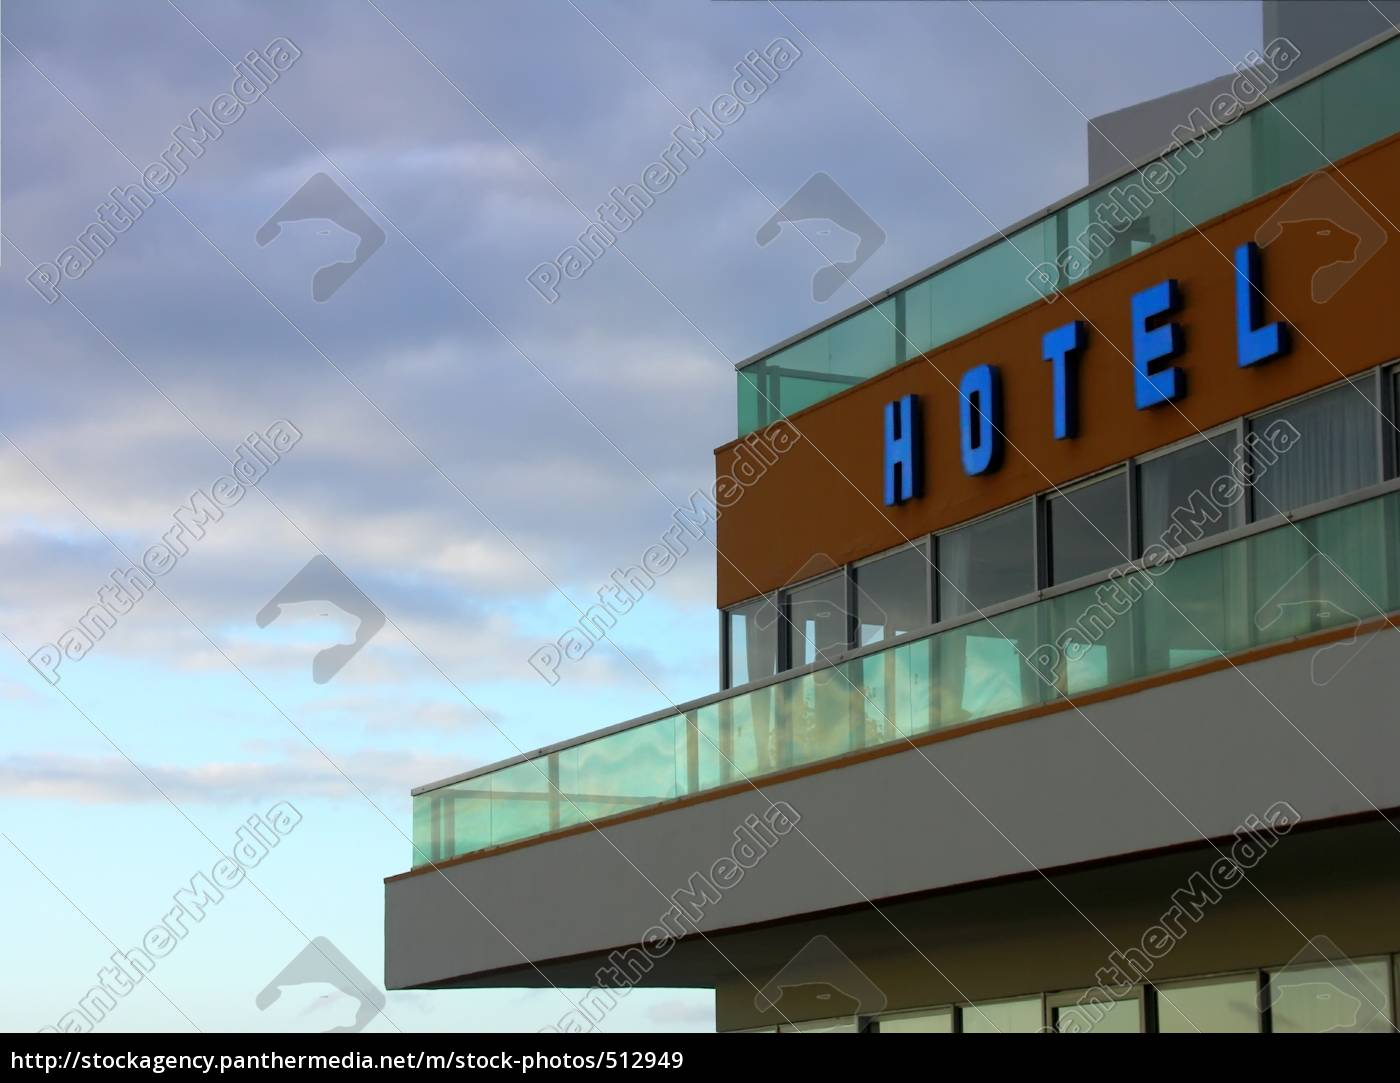 blue, hotel - 512949